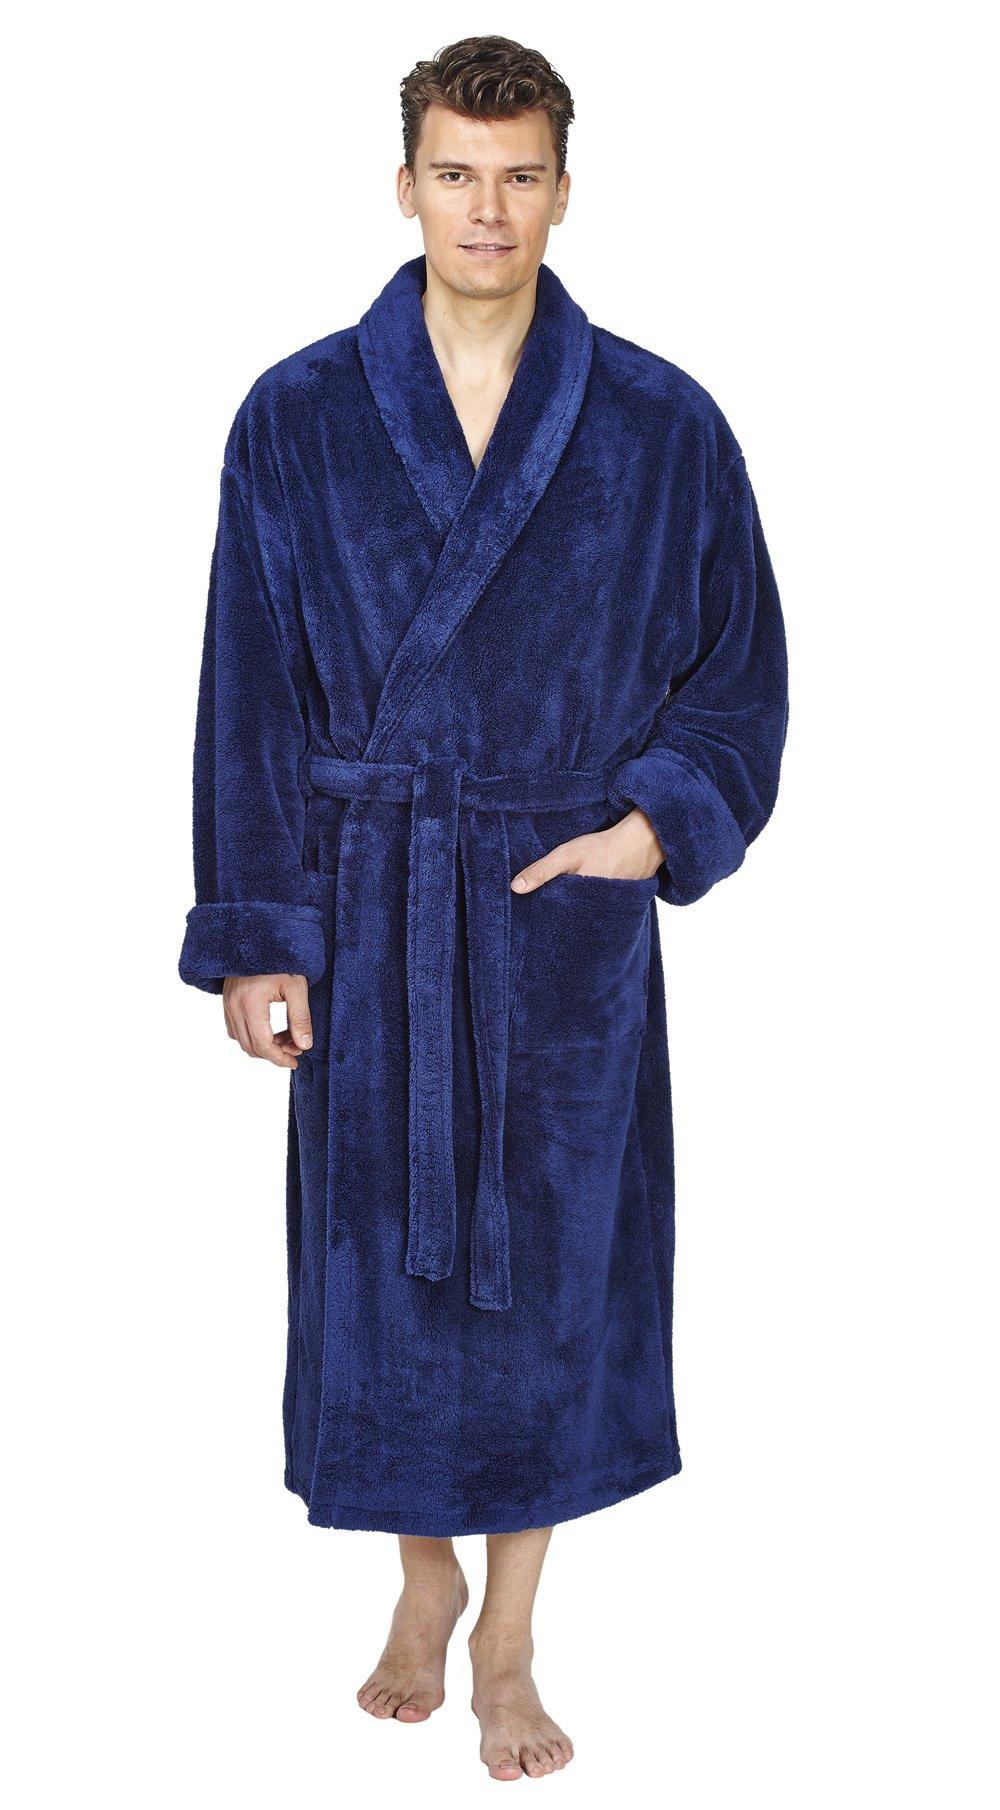 Arus Men's Shawl Fleece Bathrobe Turkish Soft Plush Robe, Navy Blue, L/XL